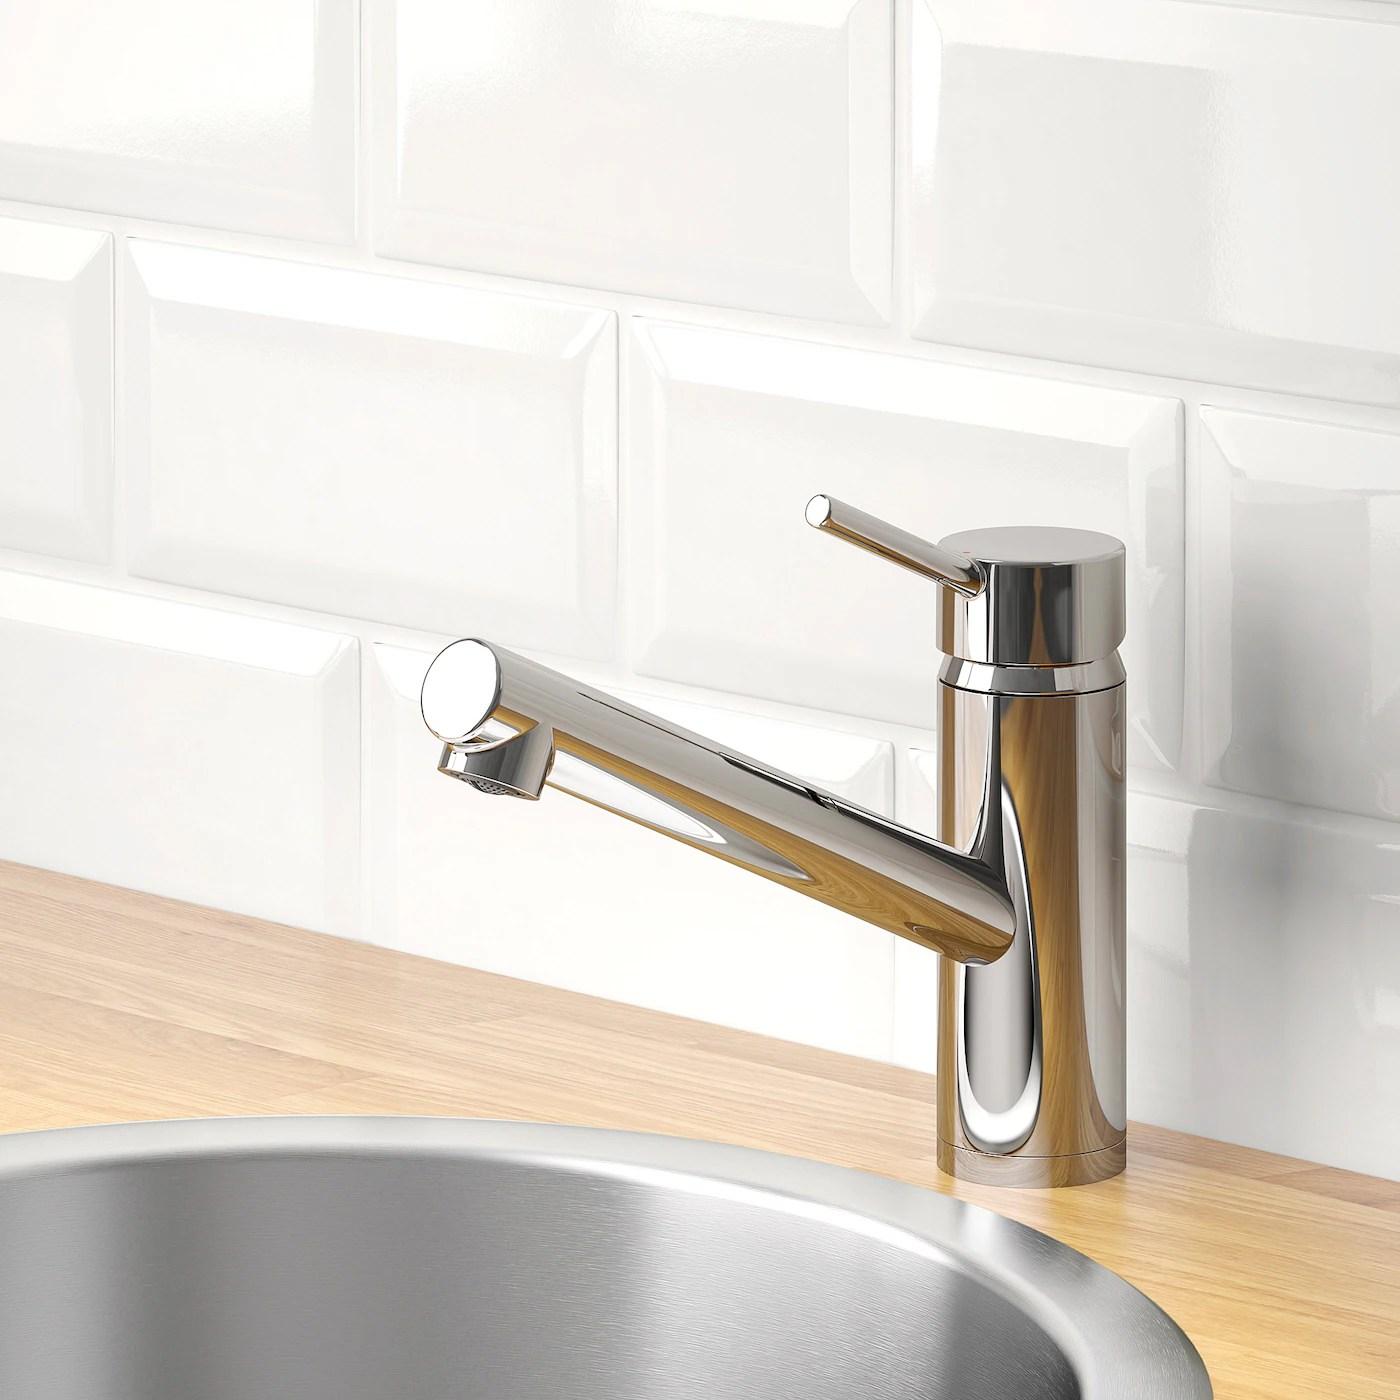 yttran kitchen faucet chrome plated